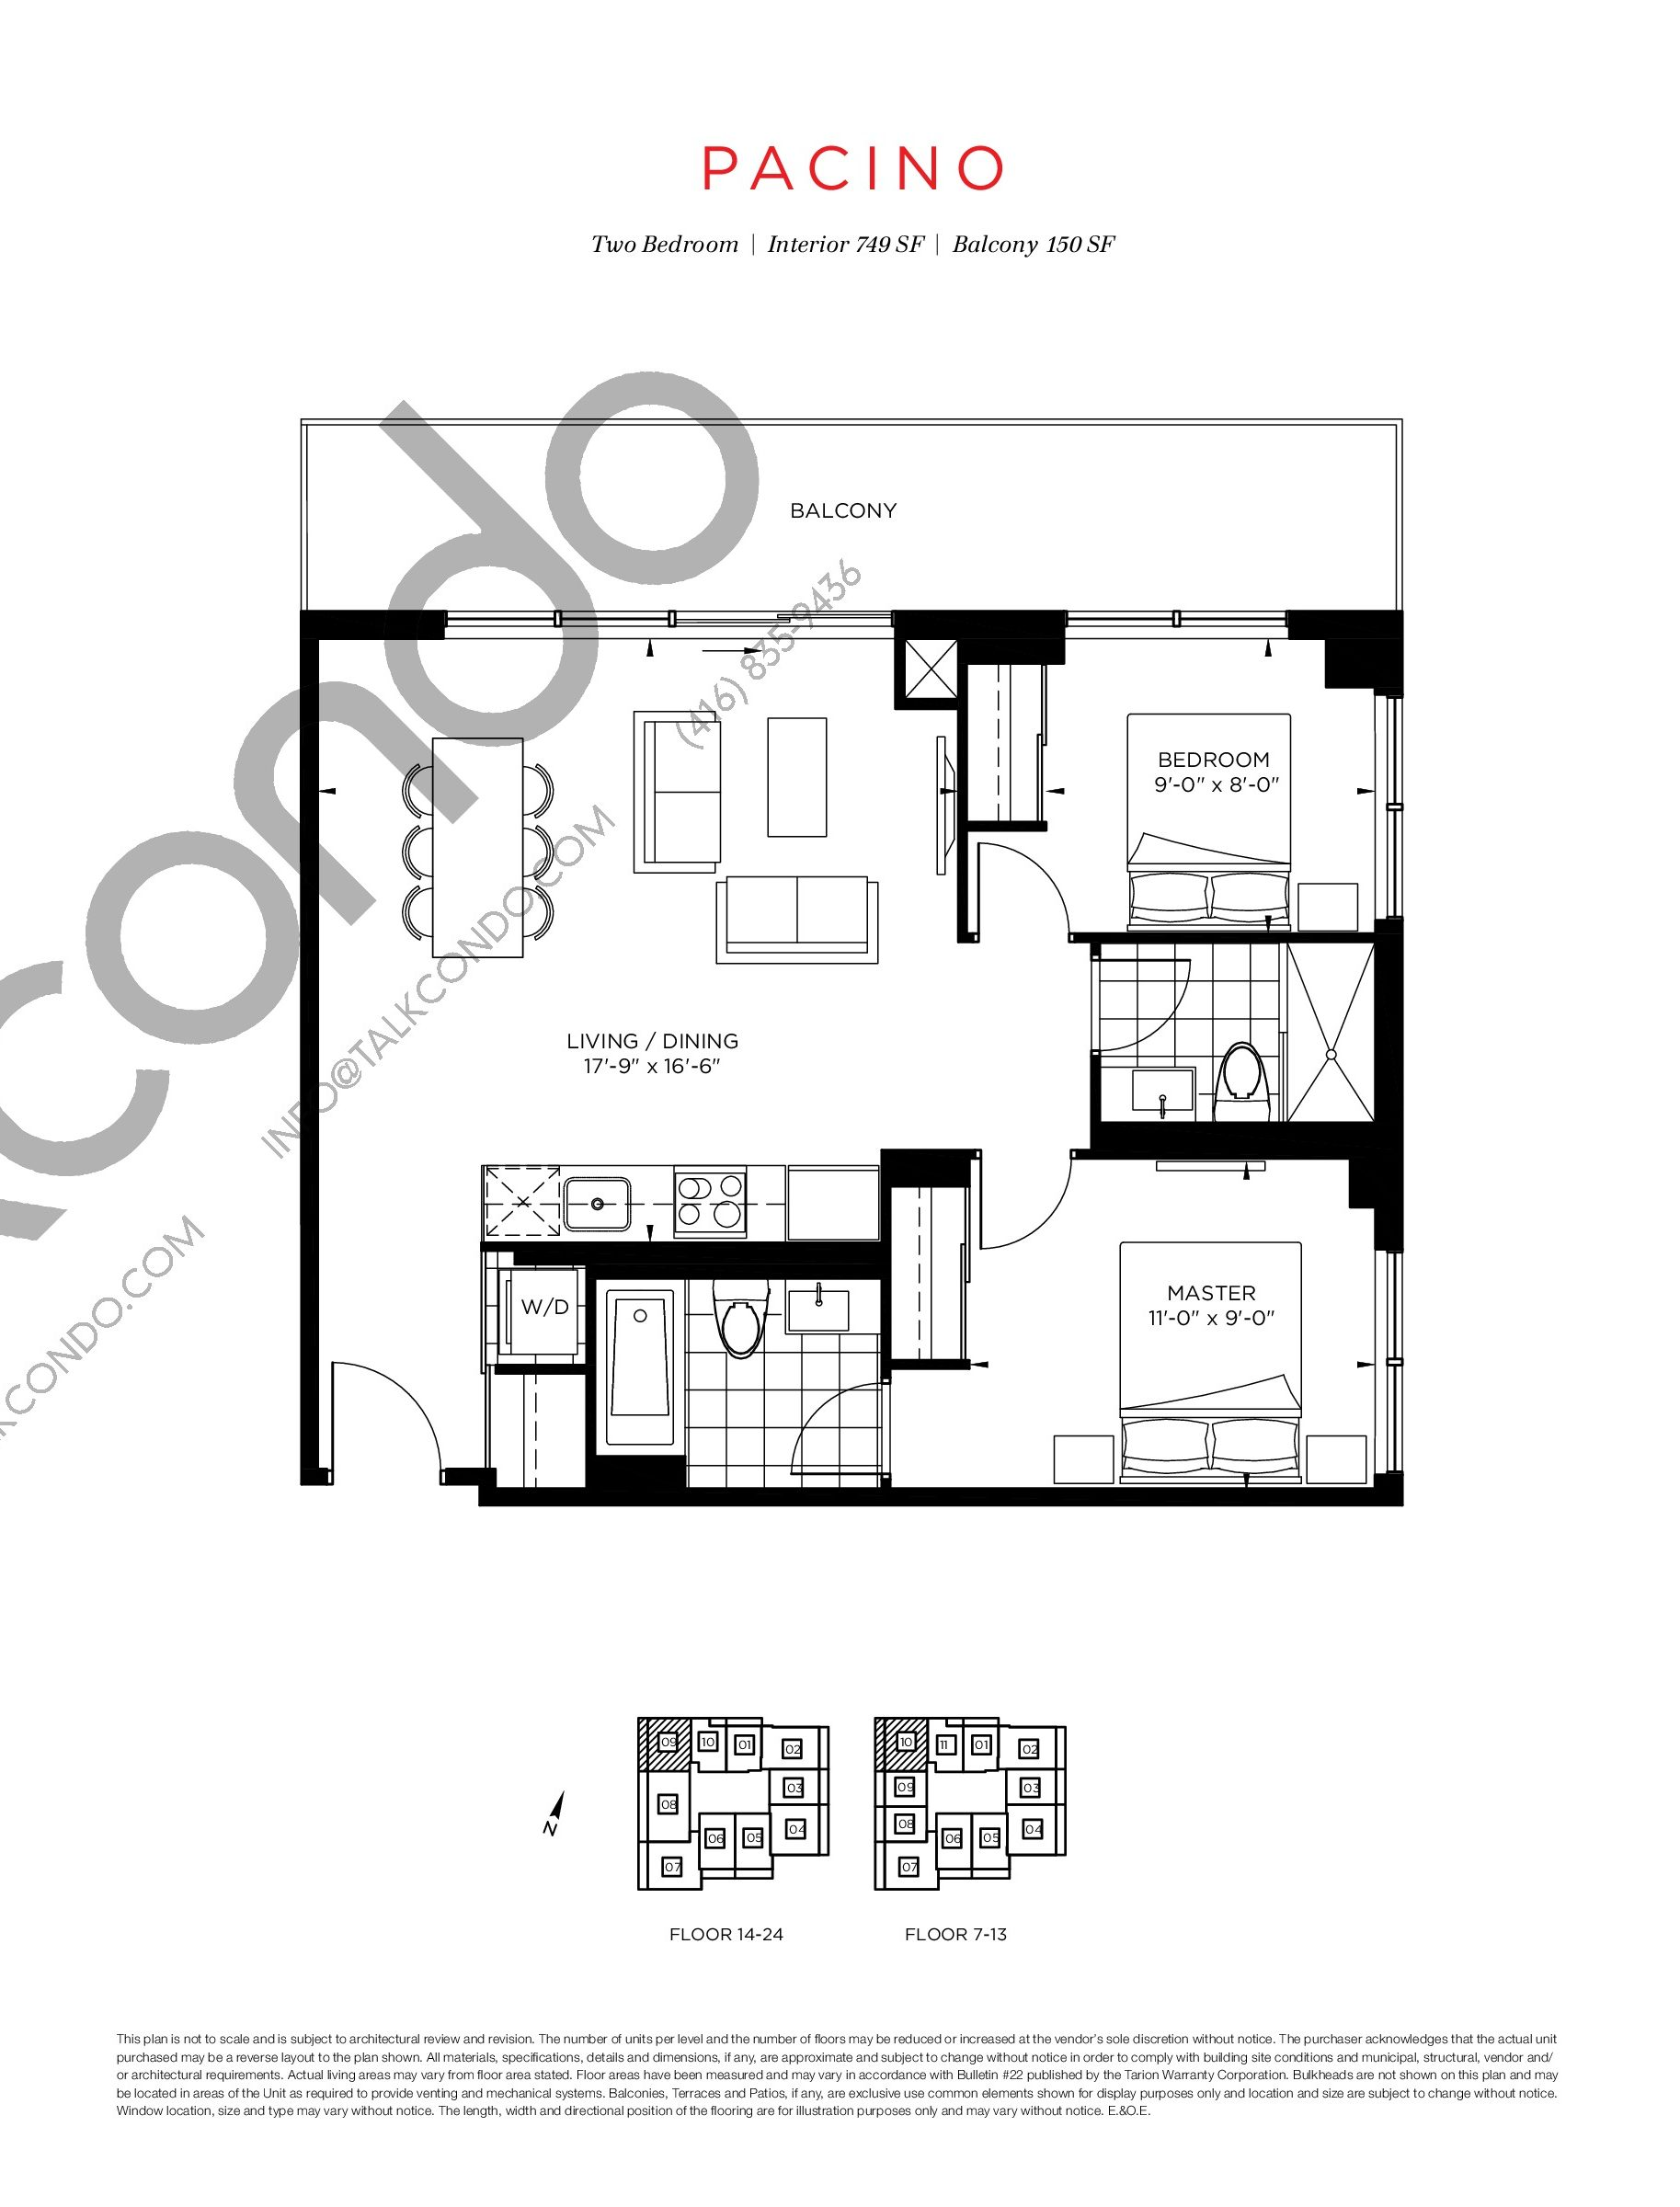 Pacino Floor Plan at The Point at Emerald City Condos - 749 sq.ft